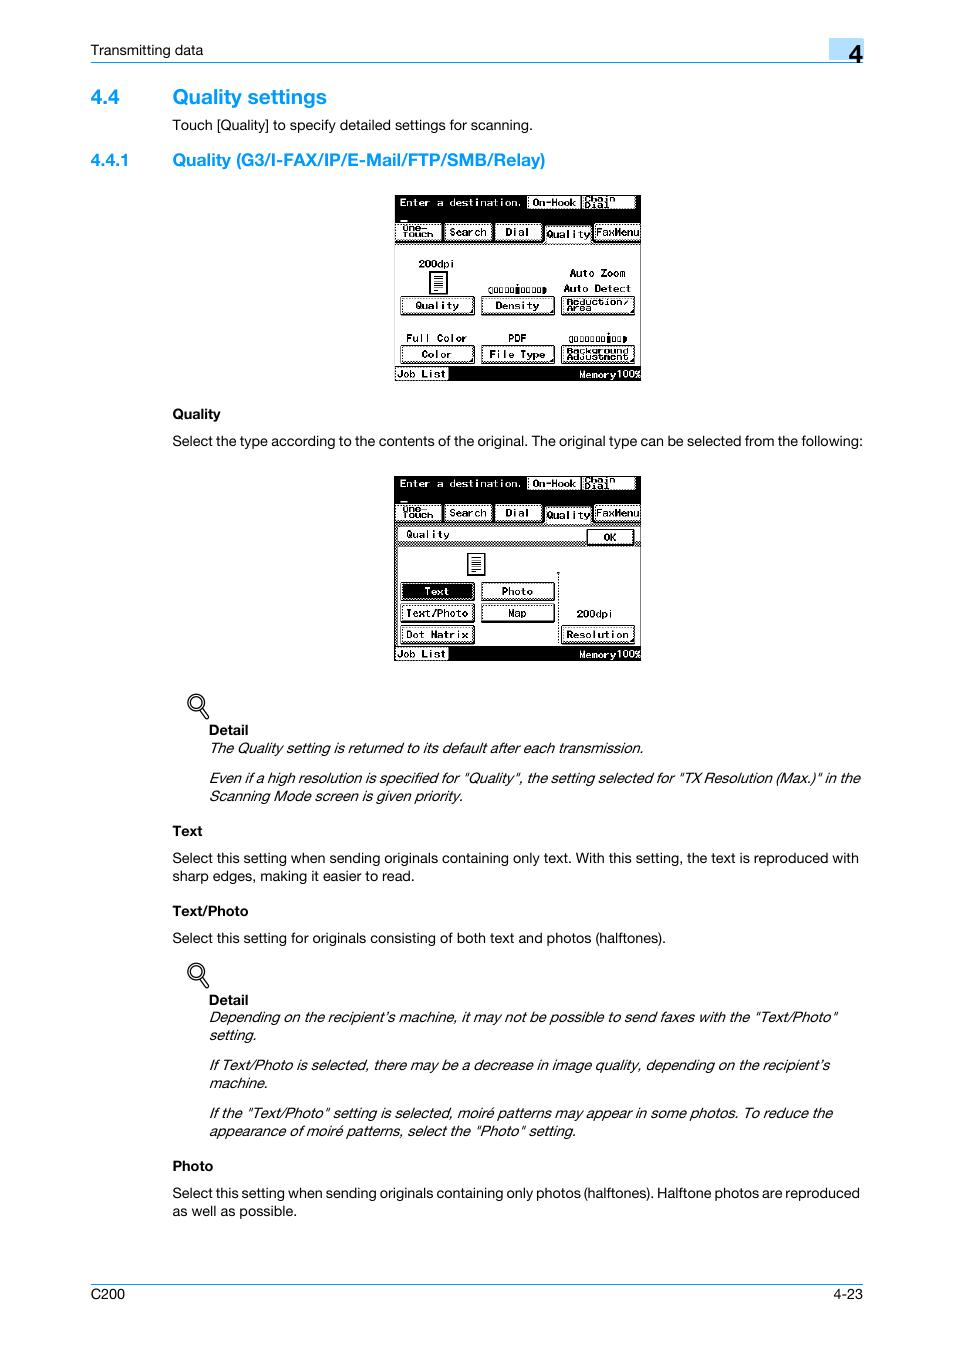 4 quality settings, 1 quality (g3/i-fax/ip/e-mail/ftp/smb